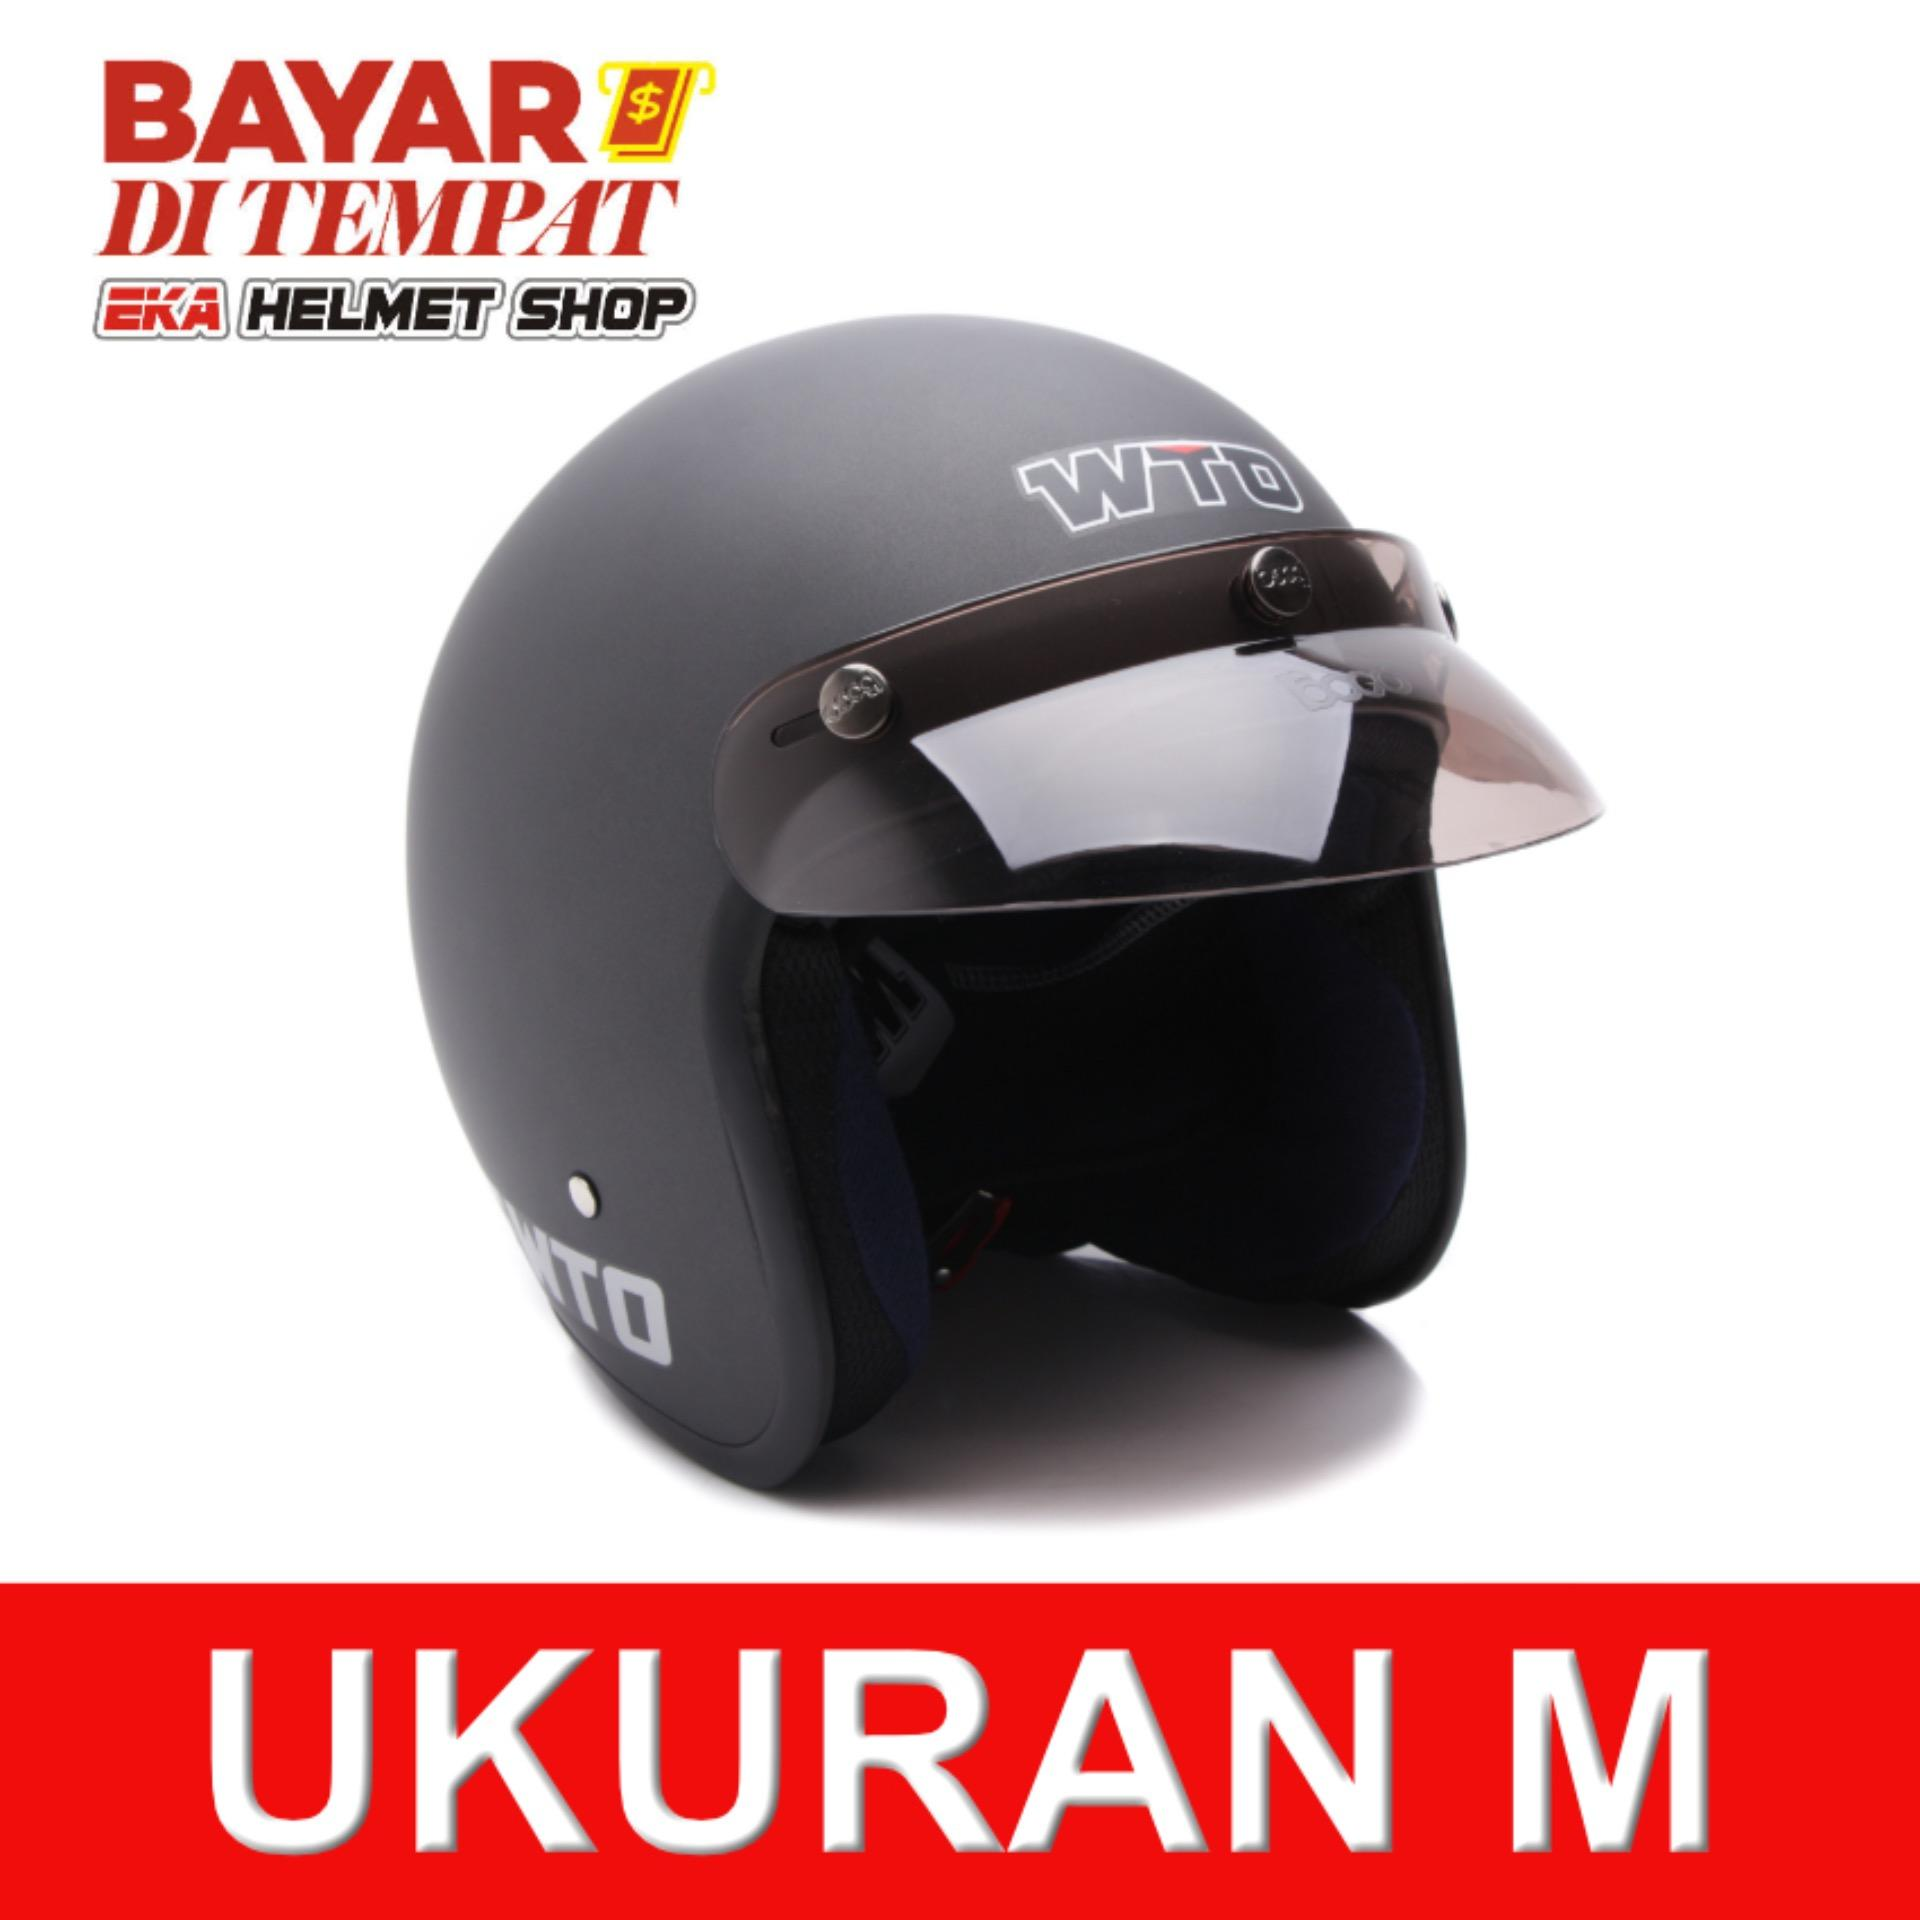 Cek Harga Baru Helm Hbc Cakil Retro Abu Doff Terkini Situs Steve Legend Hitam Wto Helmet Bogo Pet Cls1